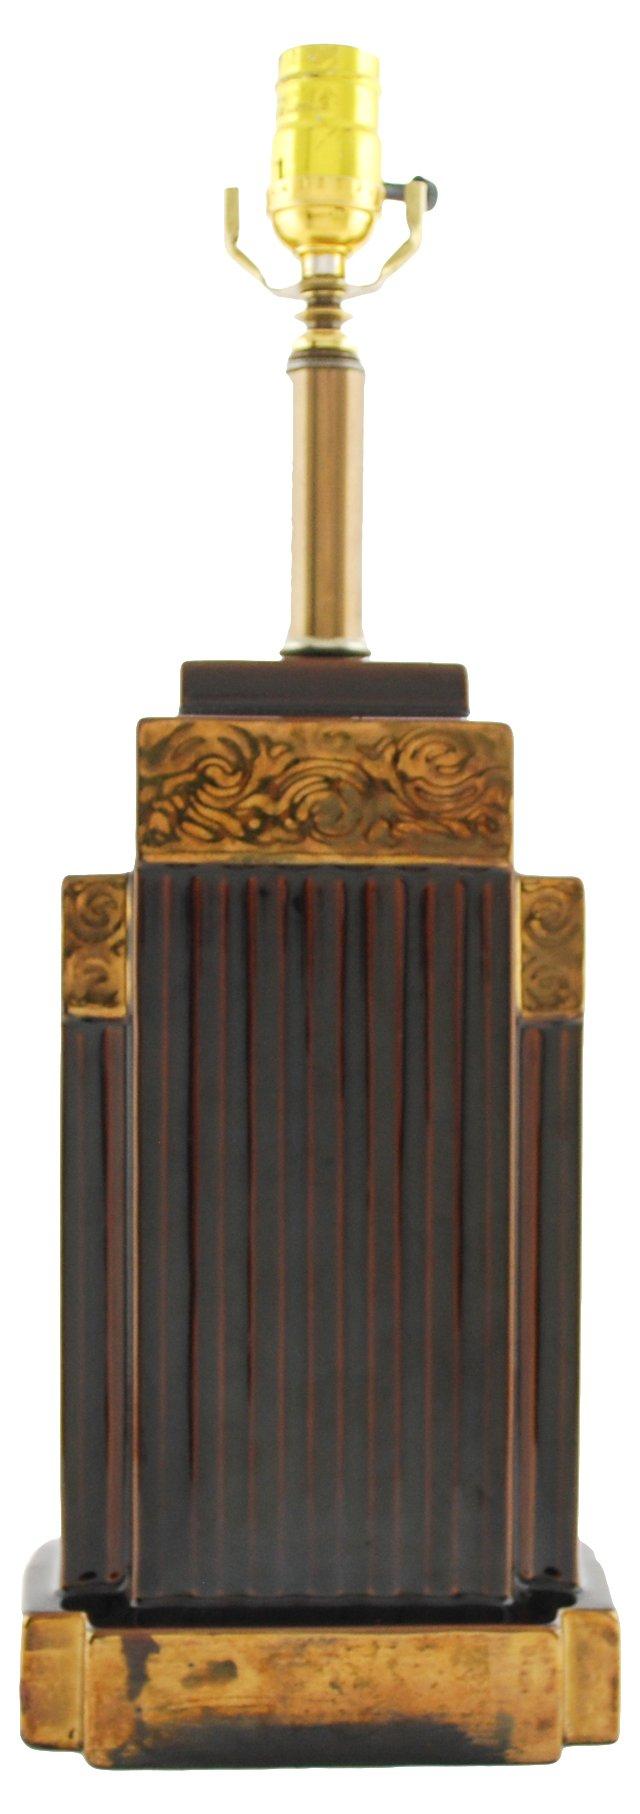 1920s French Art Deco Lamp